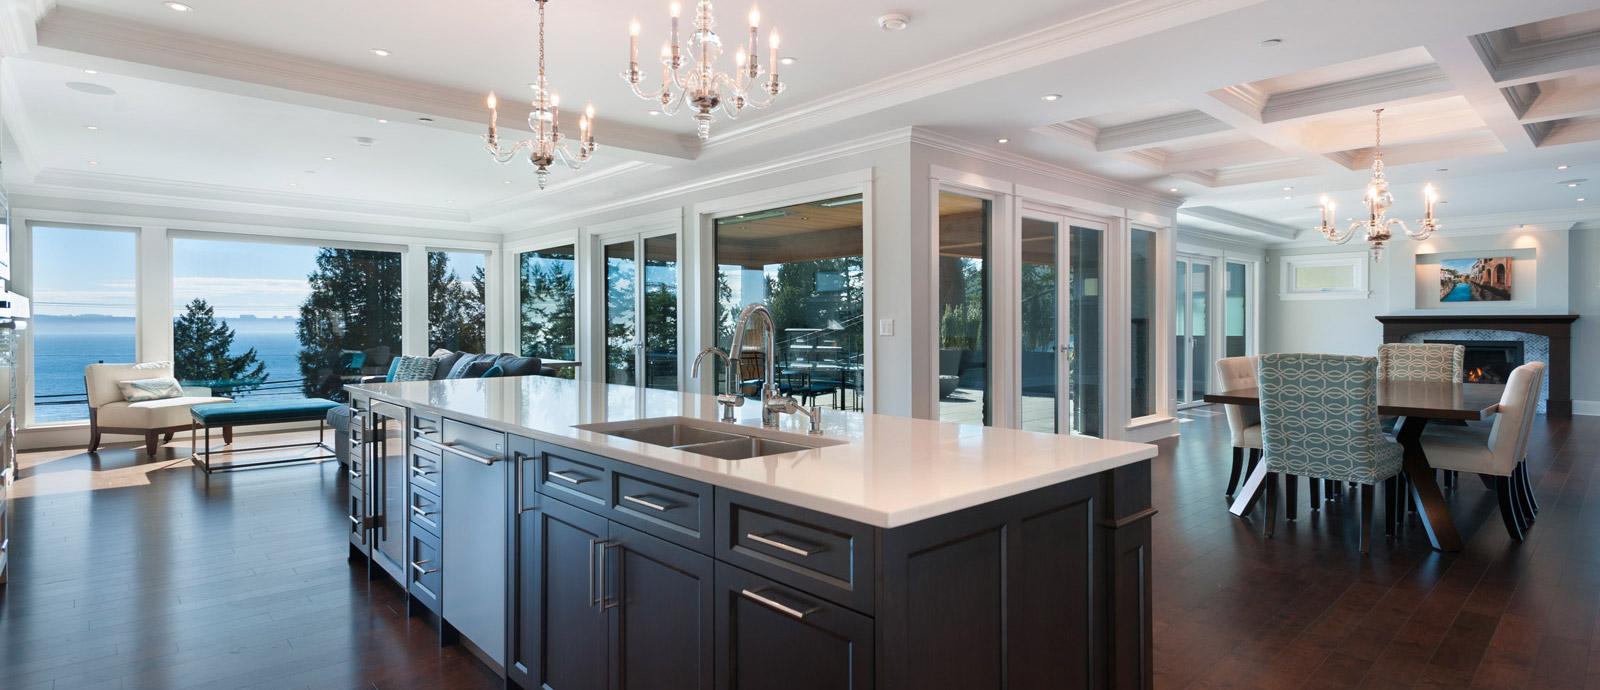 Interior Designer  Vancouver Home Design  Sarah Gallop